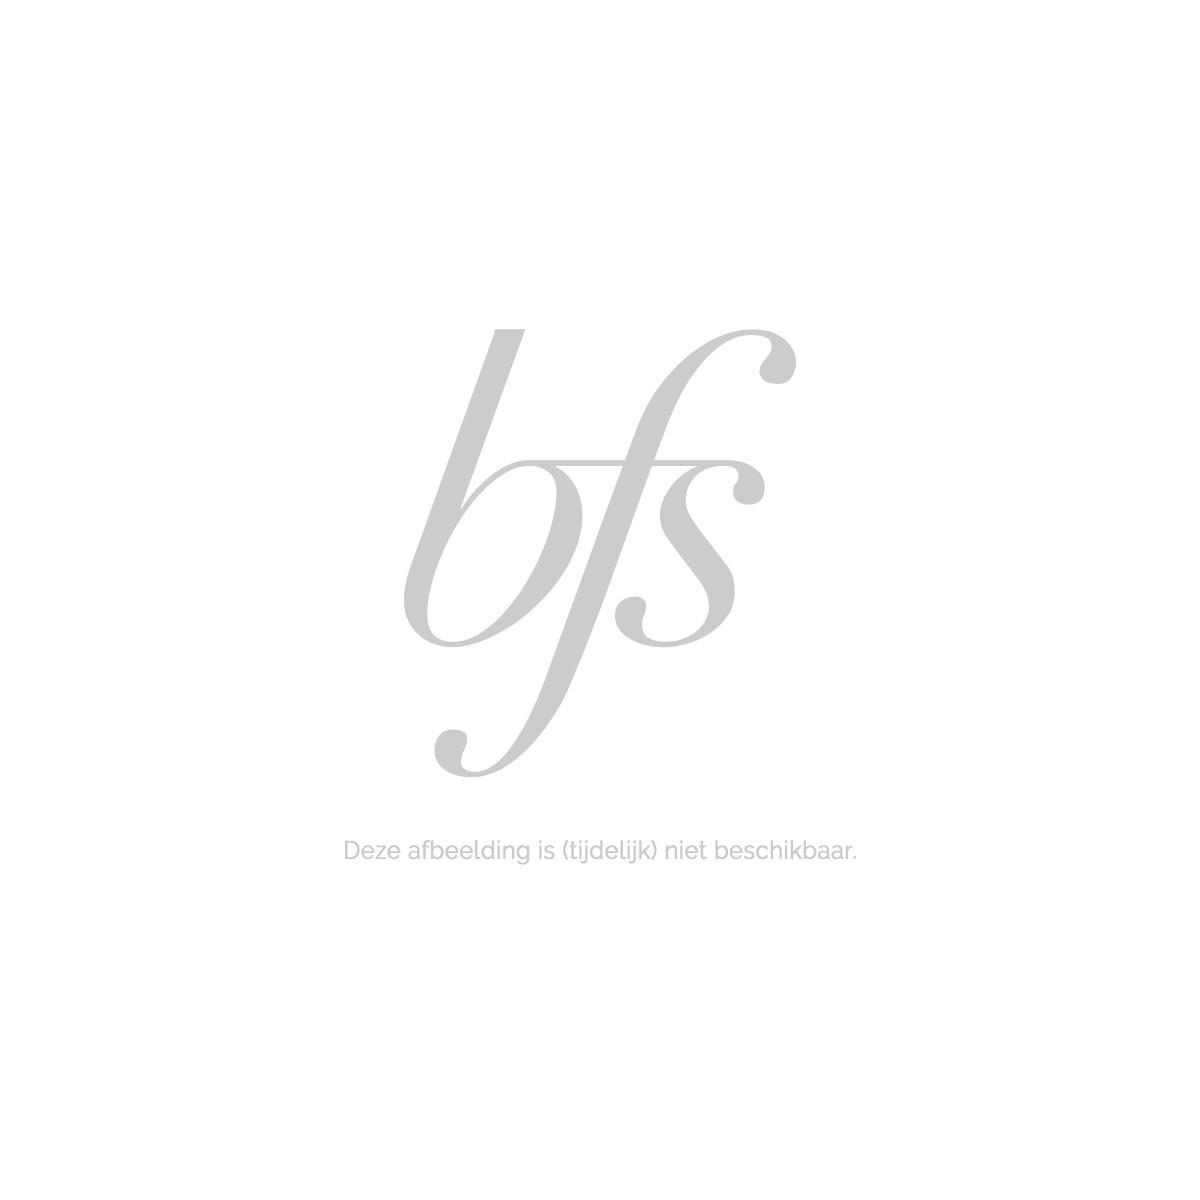 Bvlgari Omnia Crystalline Eau de Toilette 40 ml